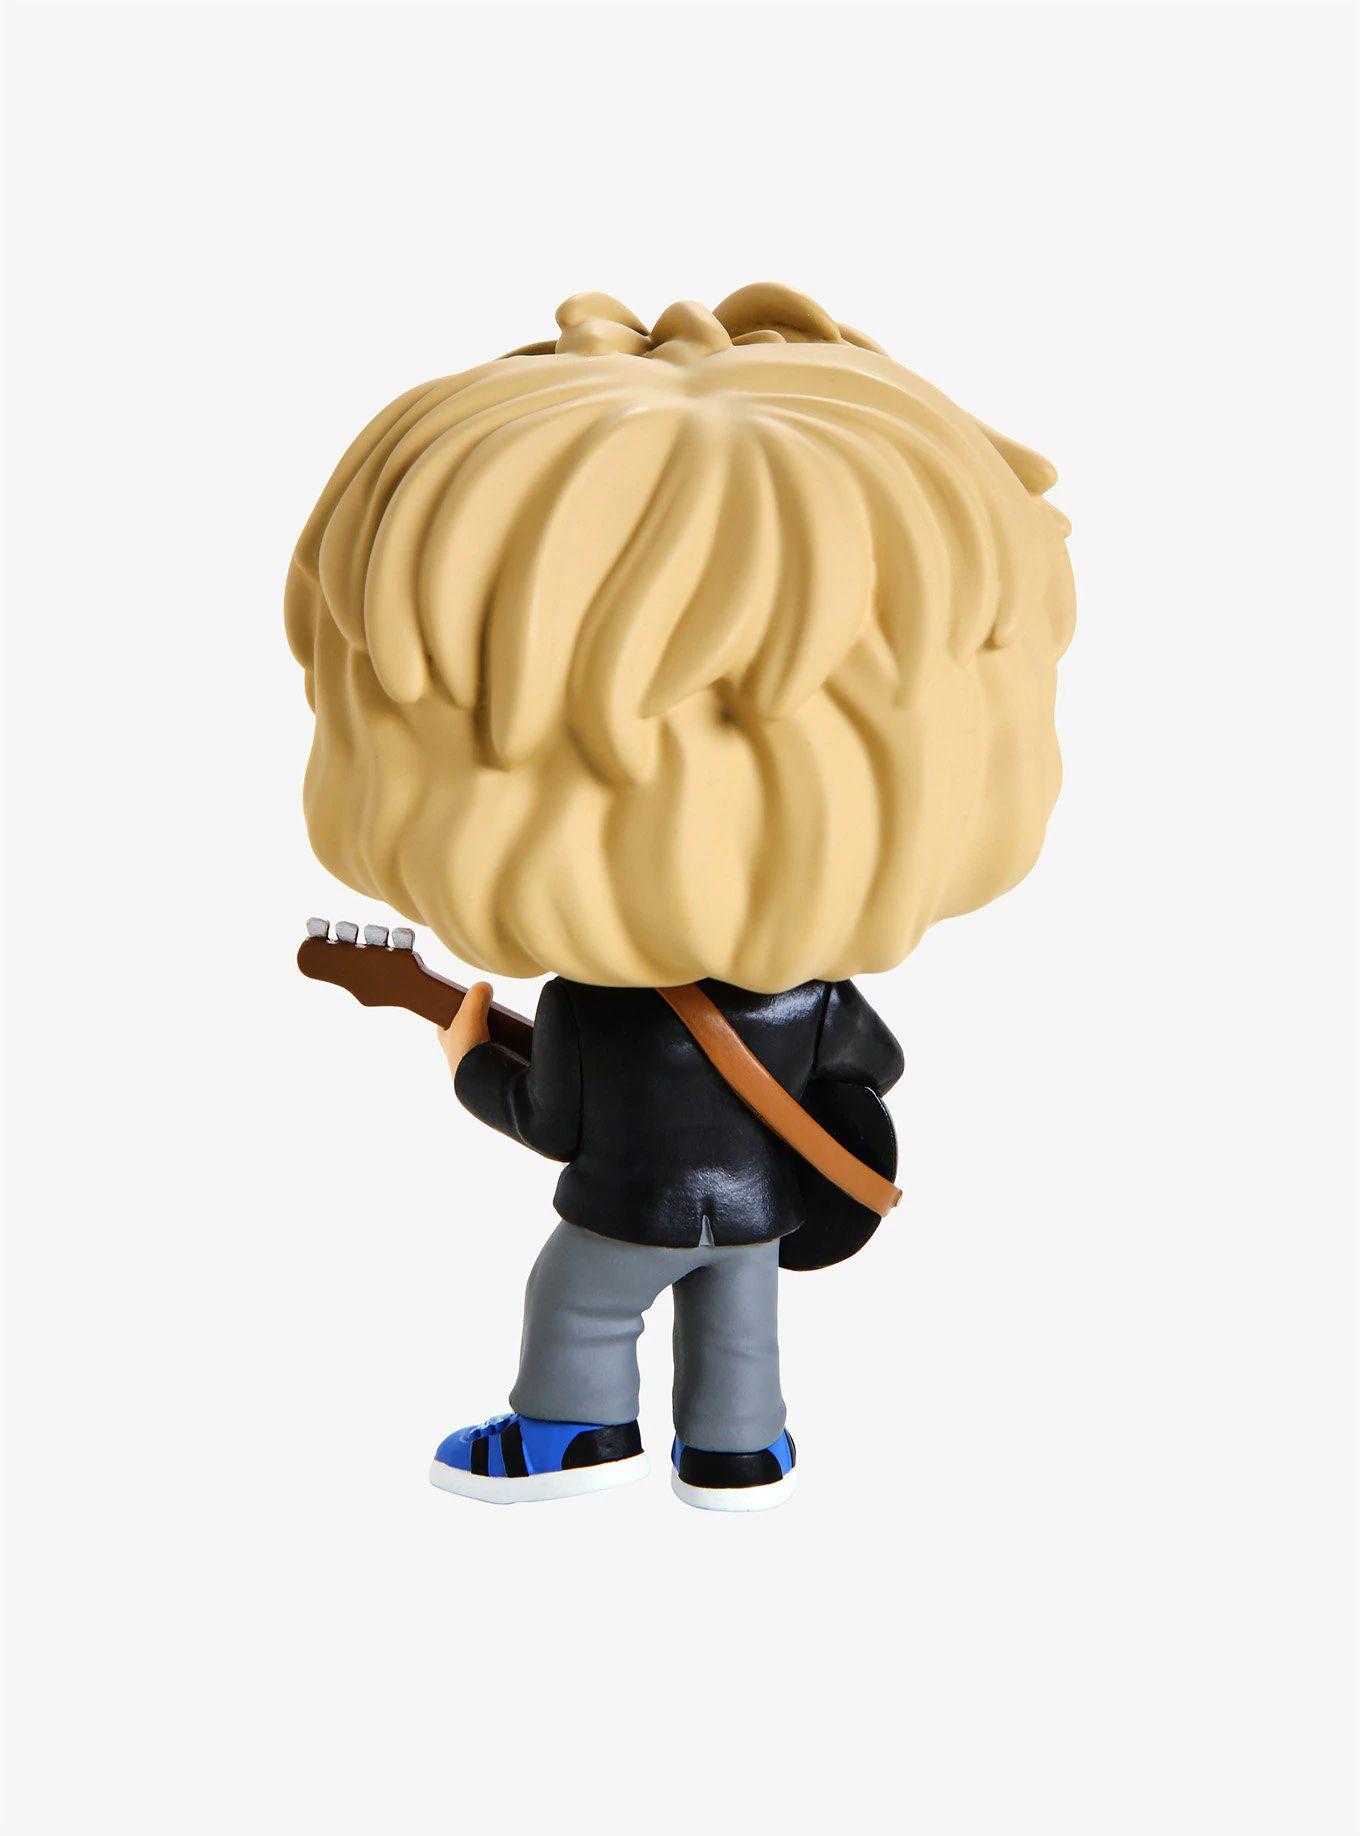 Sting #118 - The Police - Funko Pop! Rocks